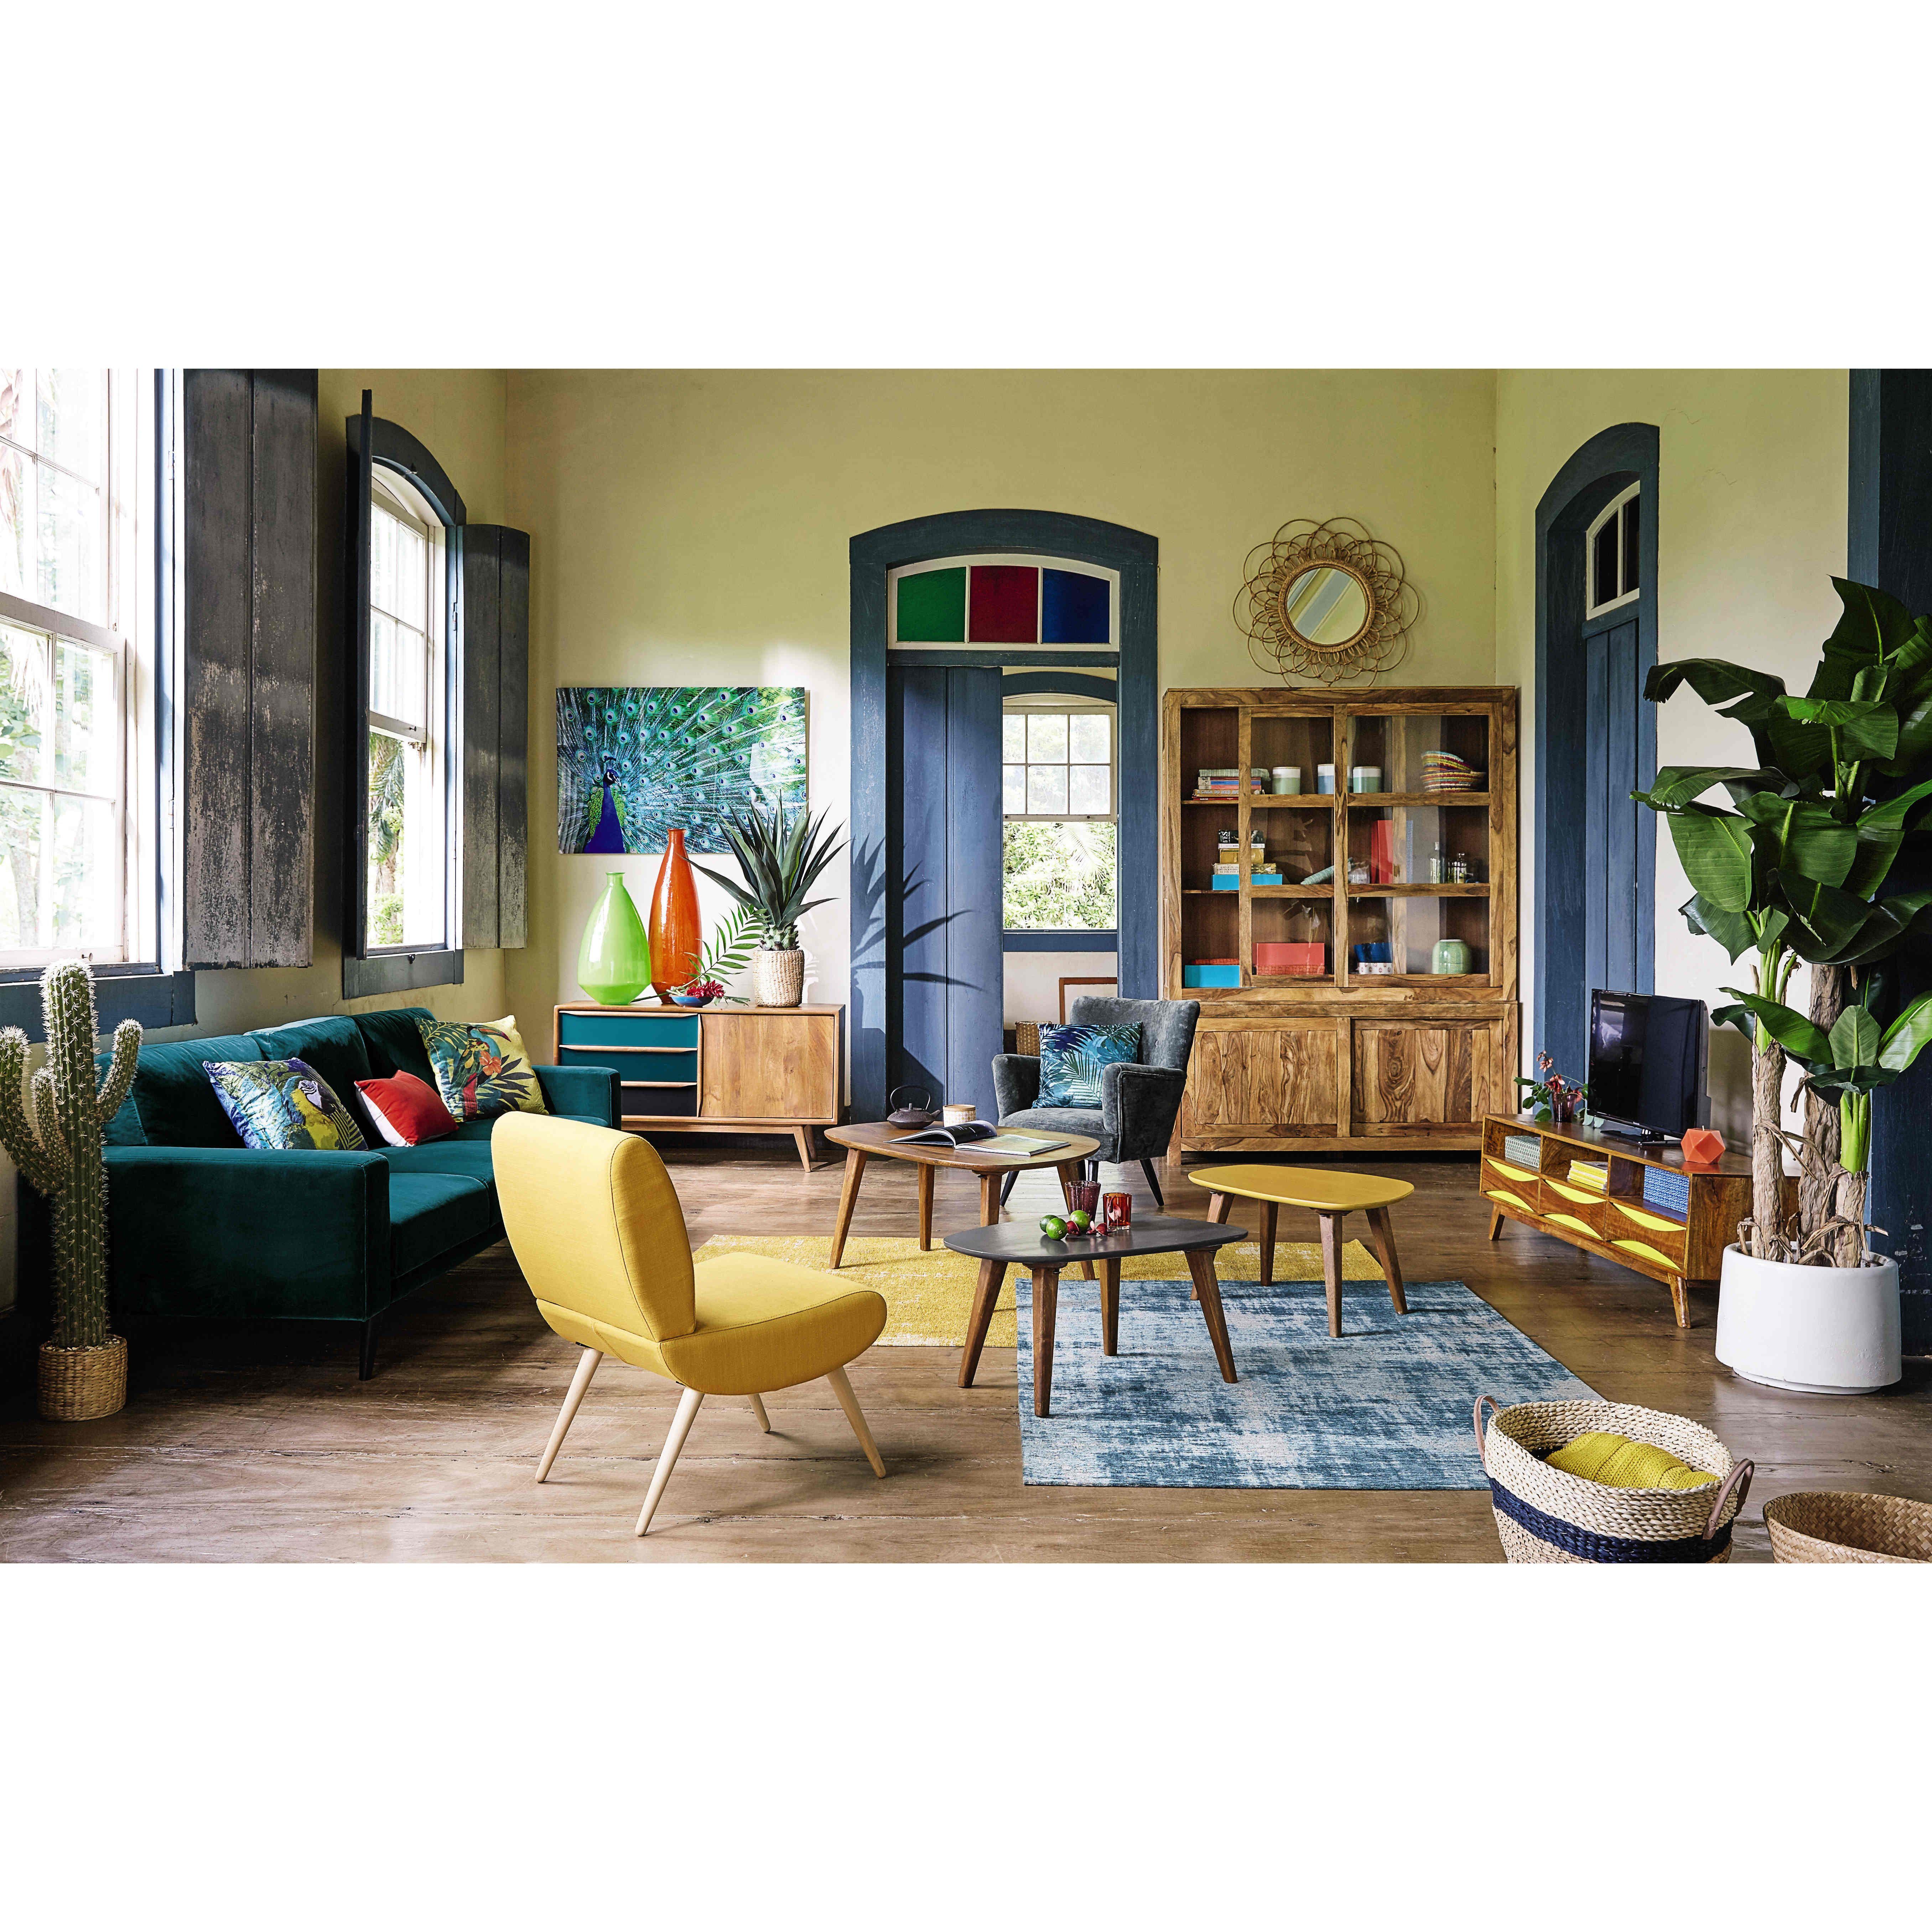 coussin bleu imprim perroquet 45x45 en 2019 exotique et. Black Bedroom Furniture Sets. Home Design Ideas